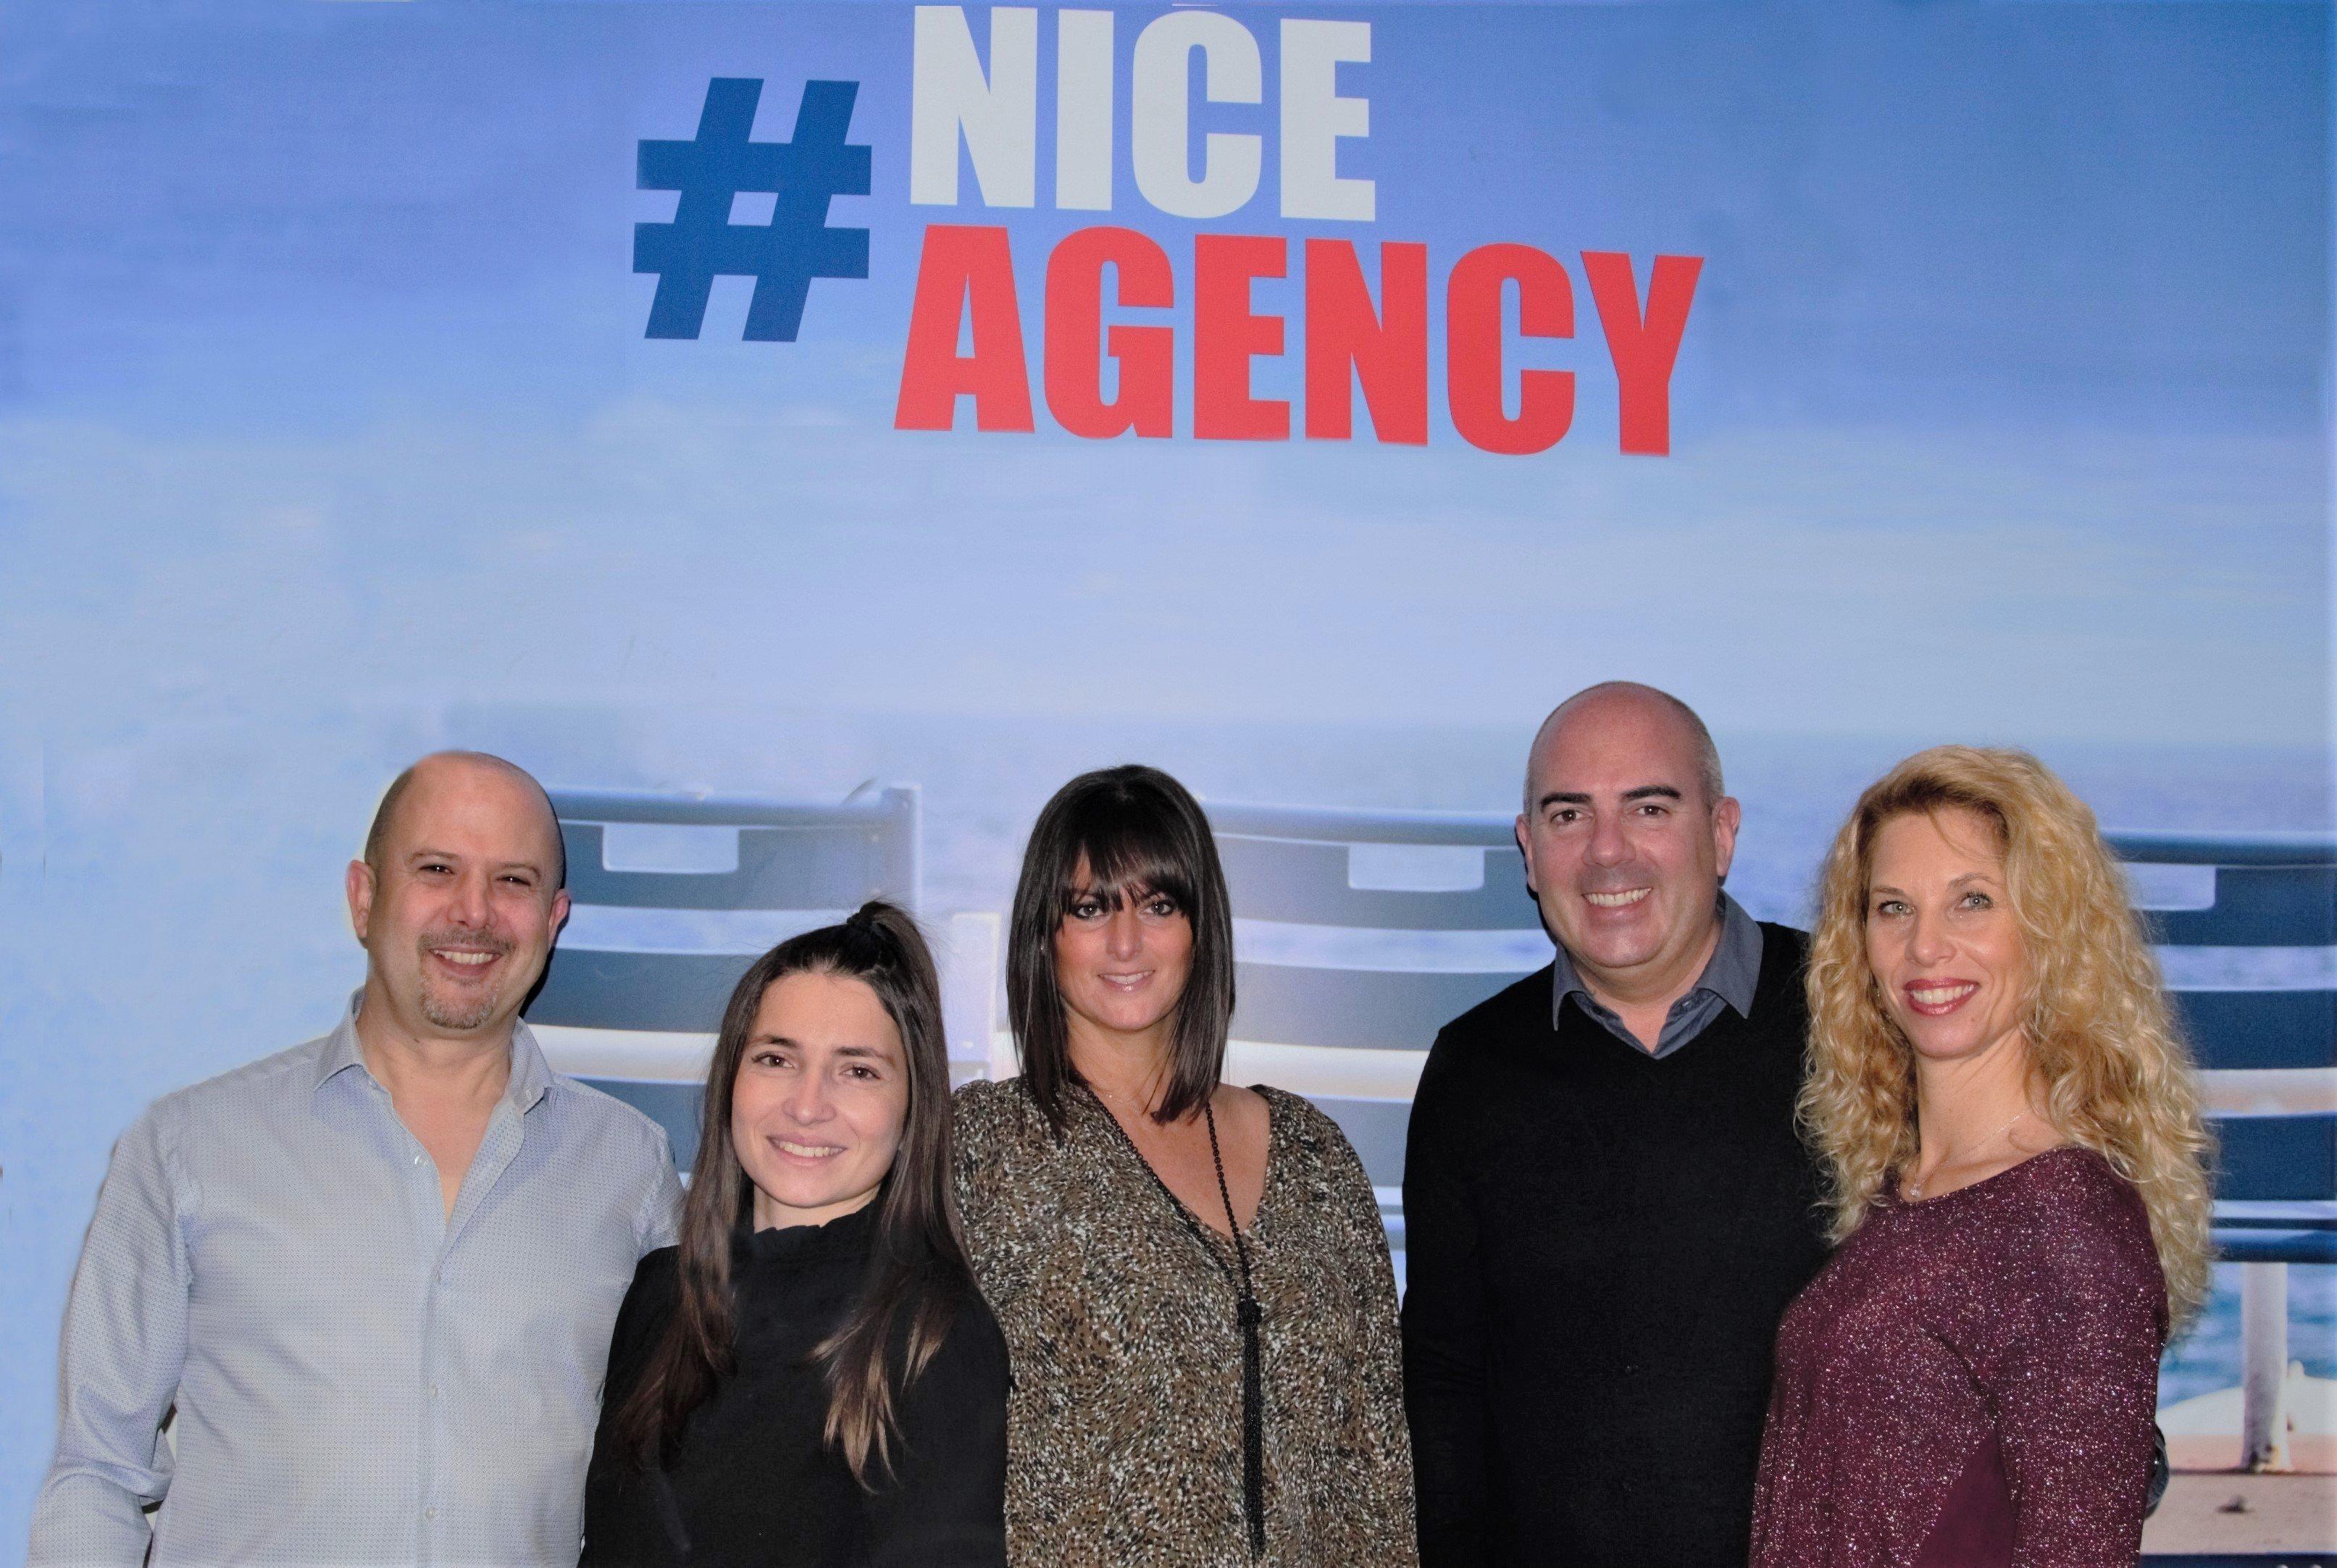 Nice Agency